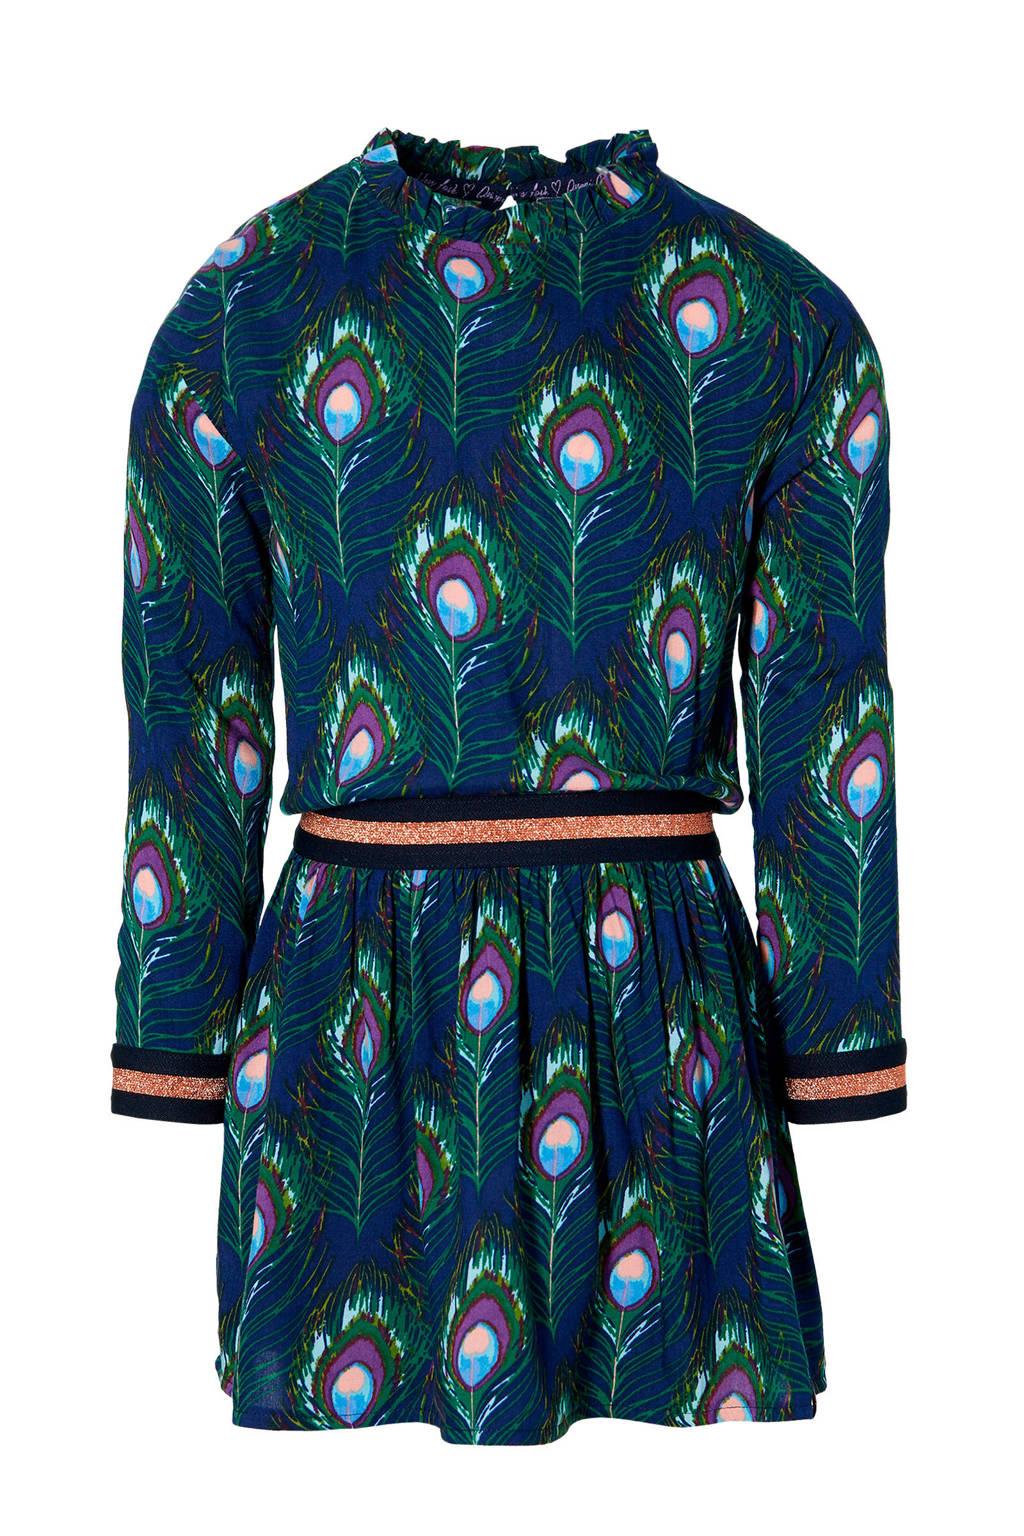 Quapi Girls jurk Delana met dierenprint groen/blauw, Groen/blauw